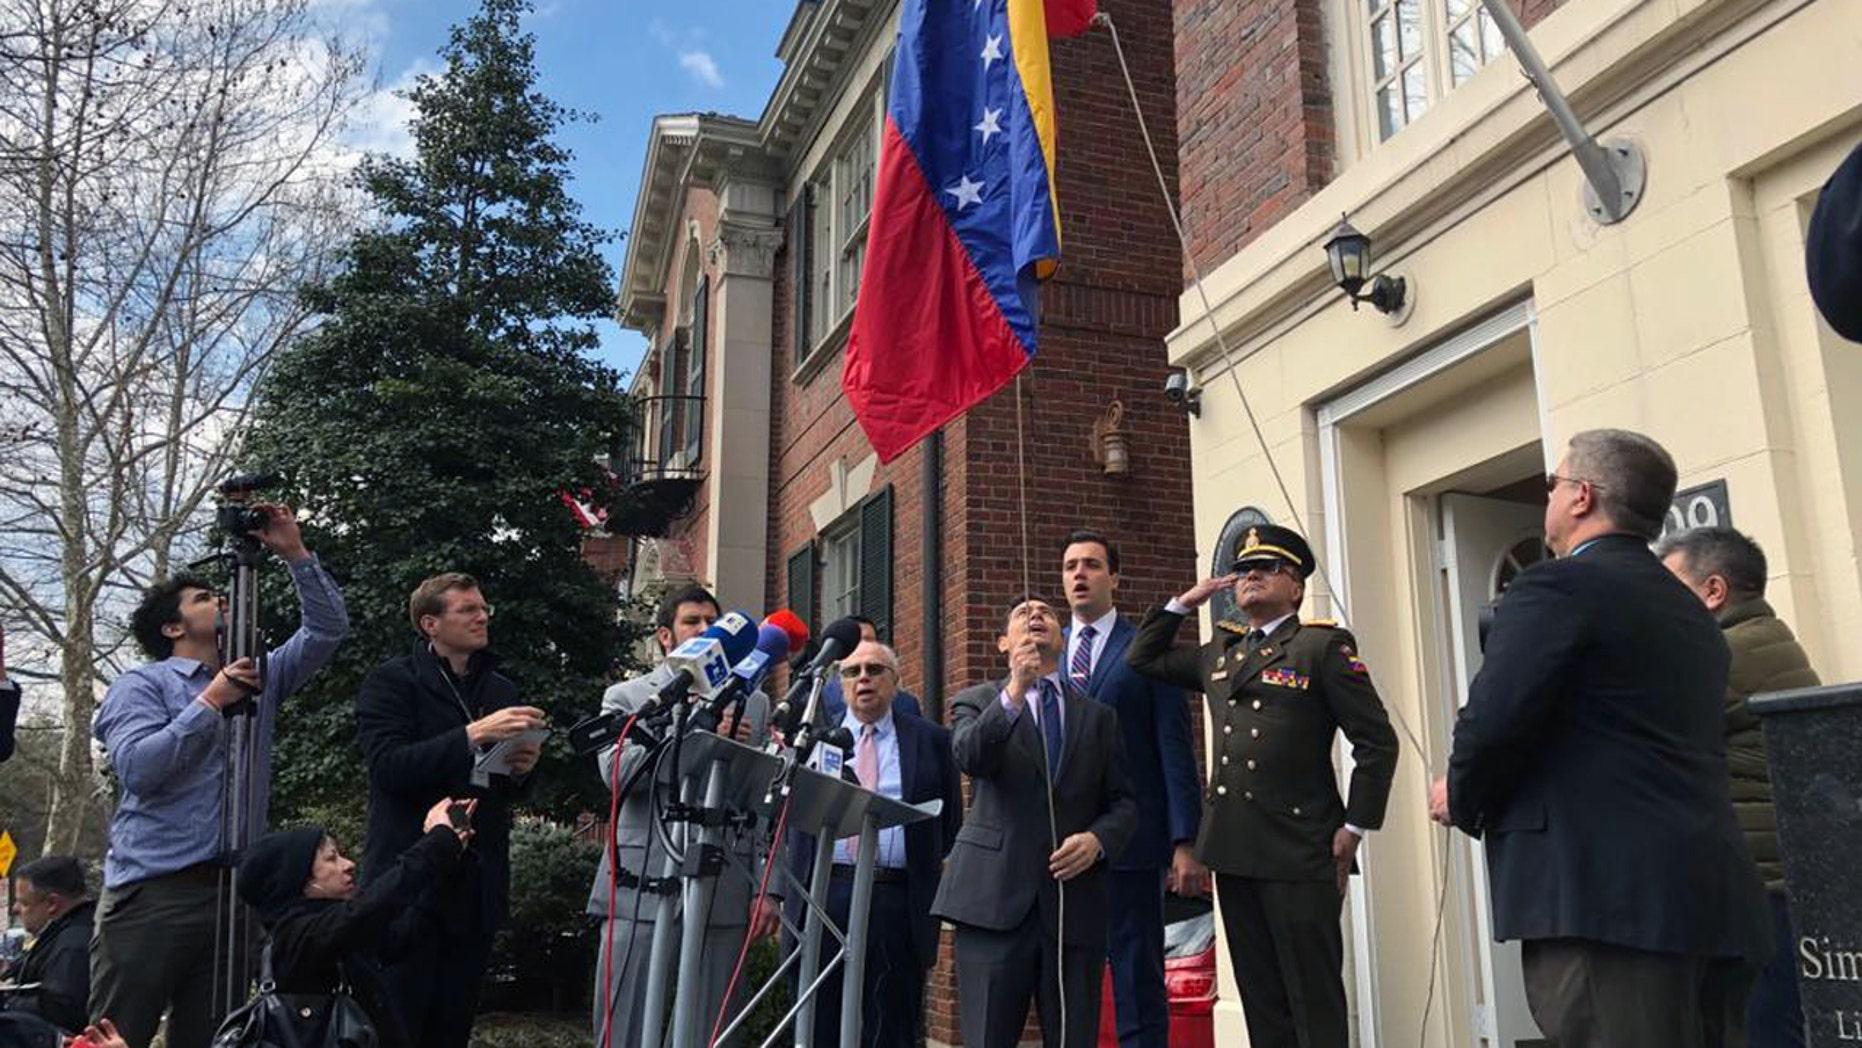 Juan Guaido's ambassador to the U.S., Carlos Vecchio, raising a Venezuelan flag outside a building belonging to Venezuela's defense ministry Monday in Washington, D.C.